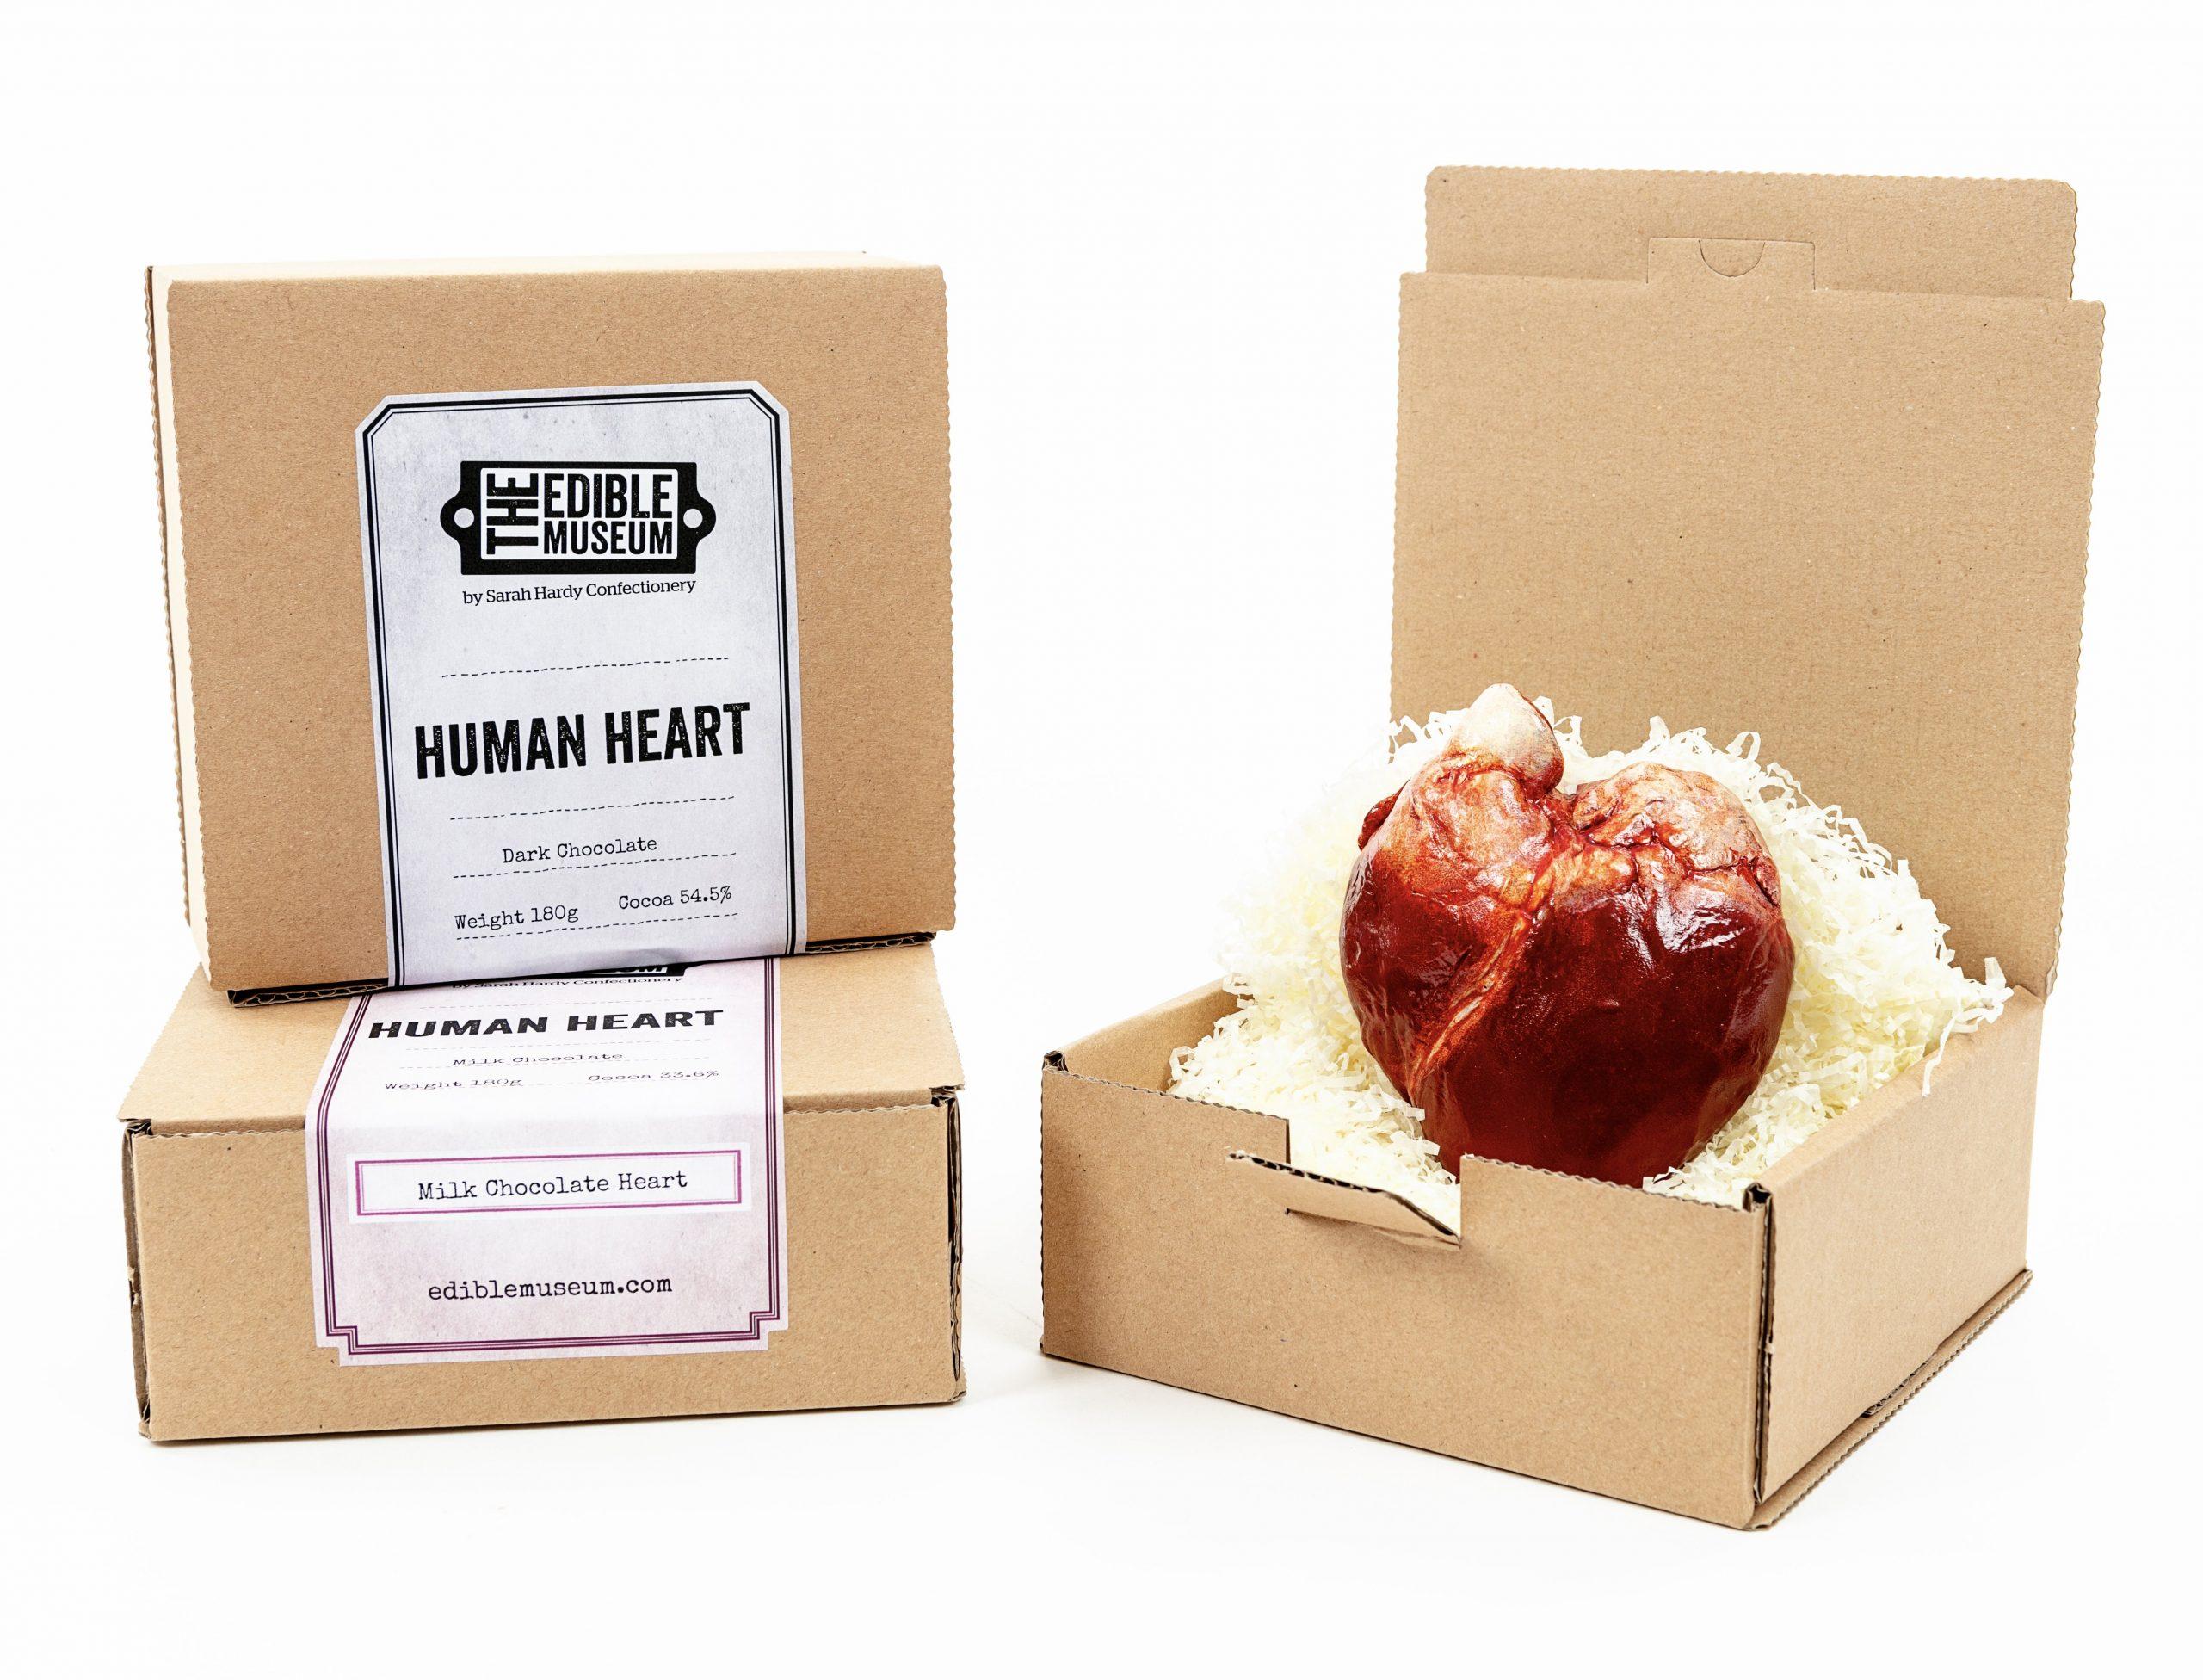 Chocolate Human heart in box